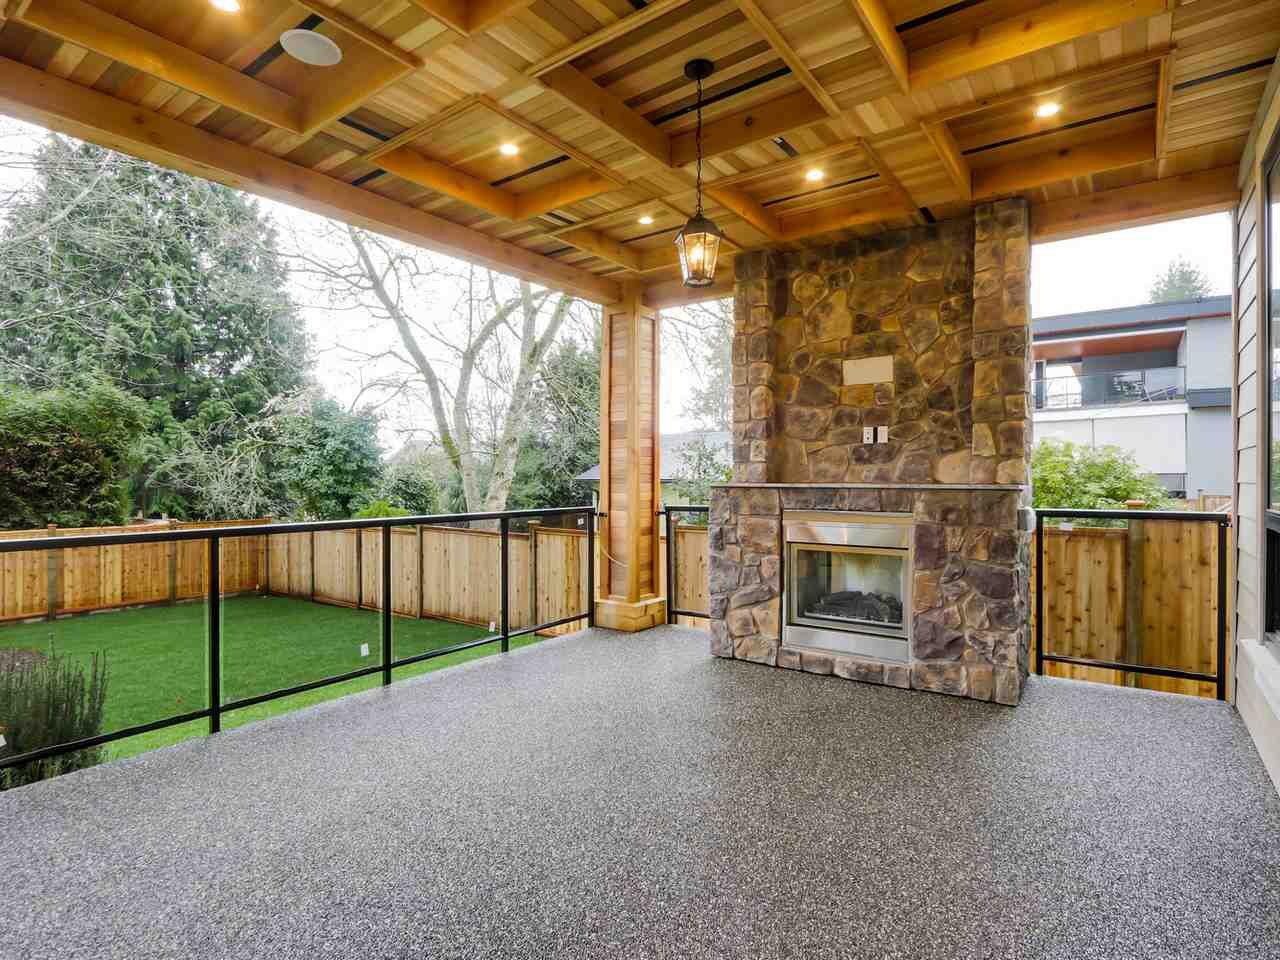 Photo 19: Photos: 1560 MAPLE Street: White Rock House for sale (South Surrey White Rock)  : MLS®# R2138926